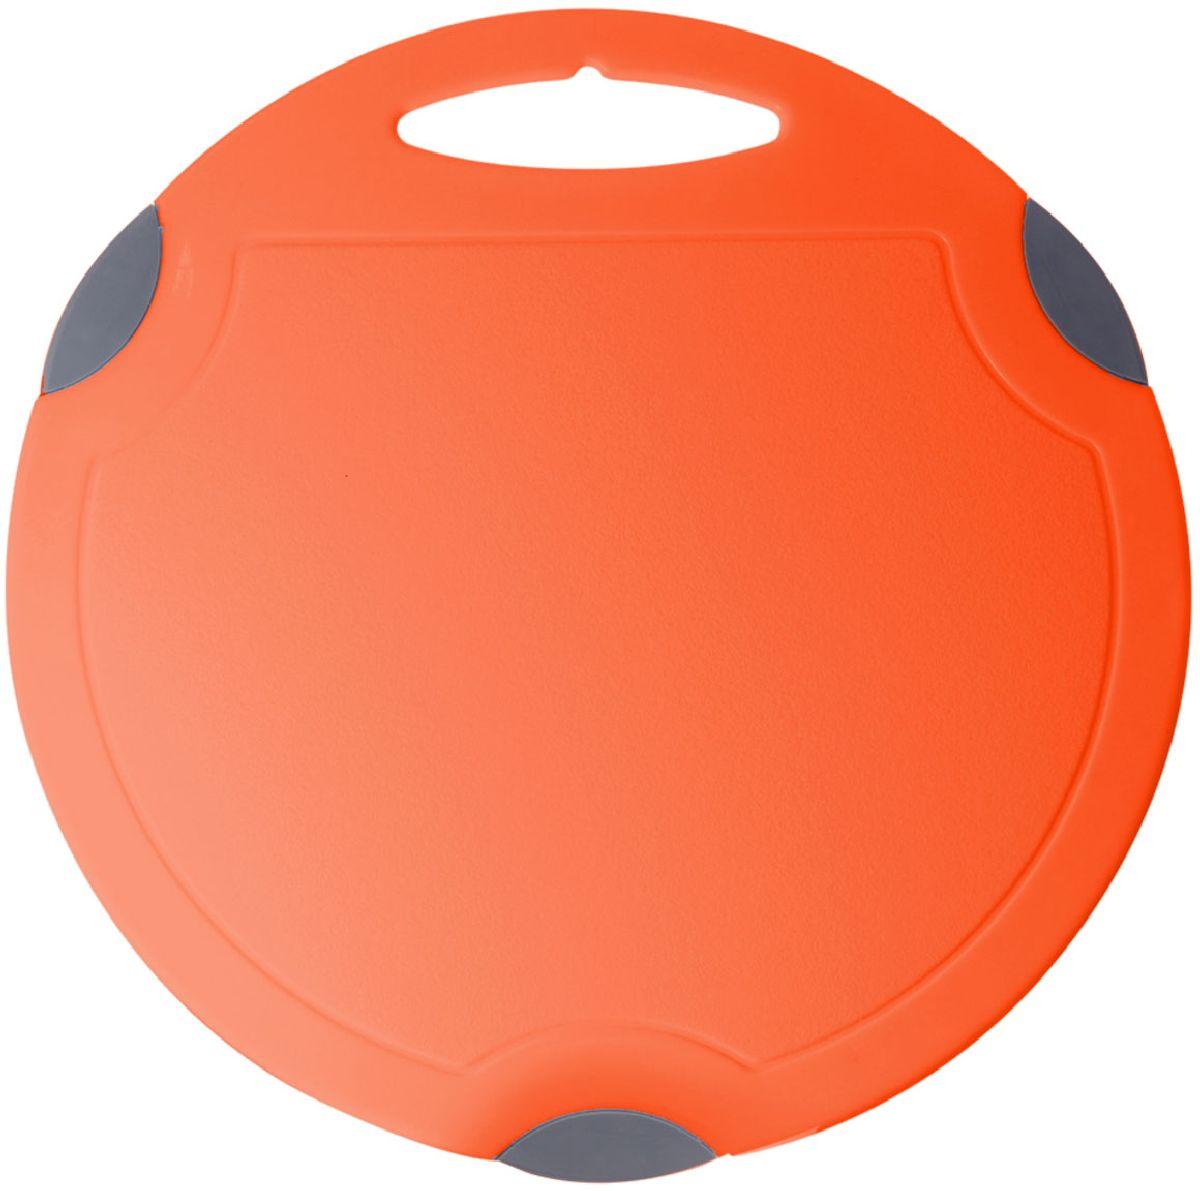 Доска разделочная Plastic Centre Люкс, цвет: оранжевый, серый, диаметр 32 см доска разделочная plastic centre люкс цвет мраморный диаметр 27 5 см